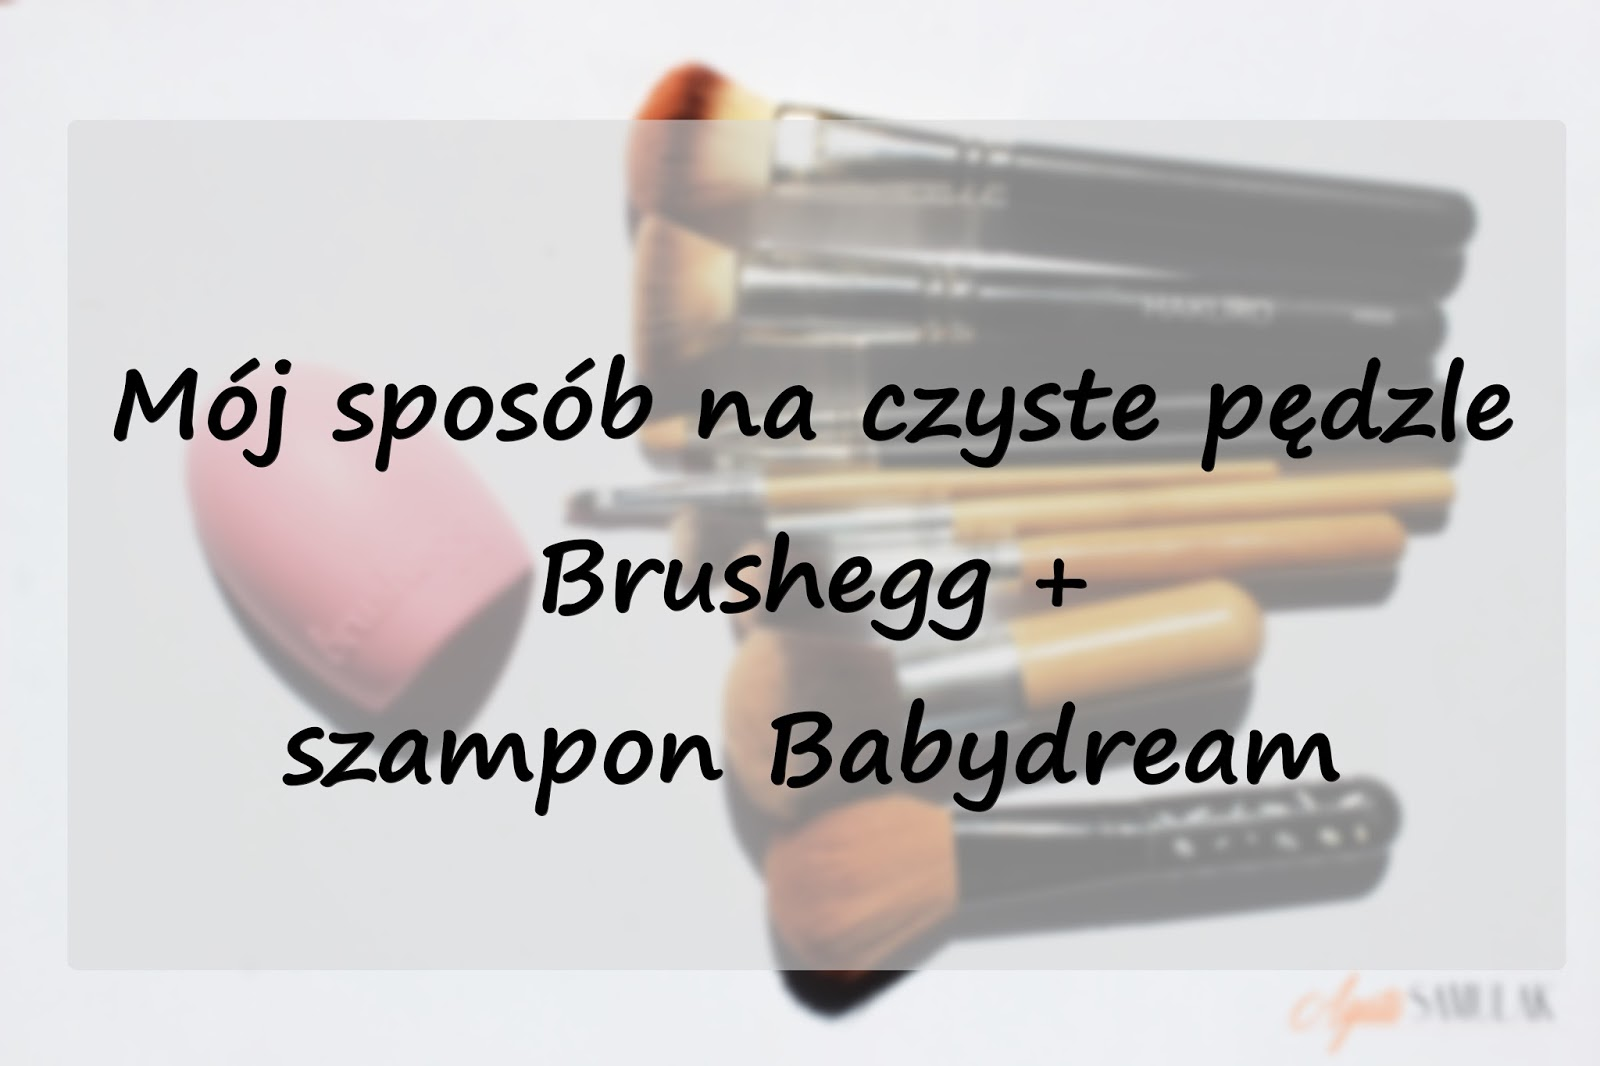 Mój sposób na czyste pędzle - Brushegg + szampon Babydream